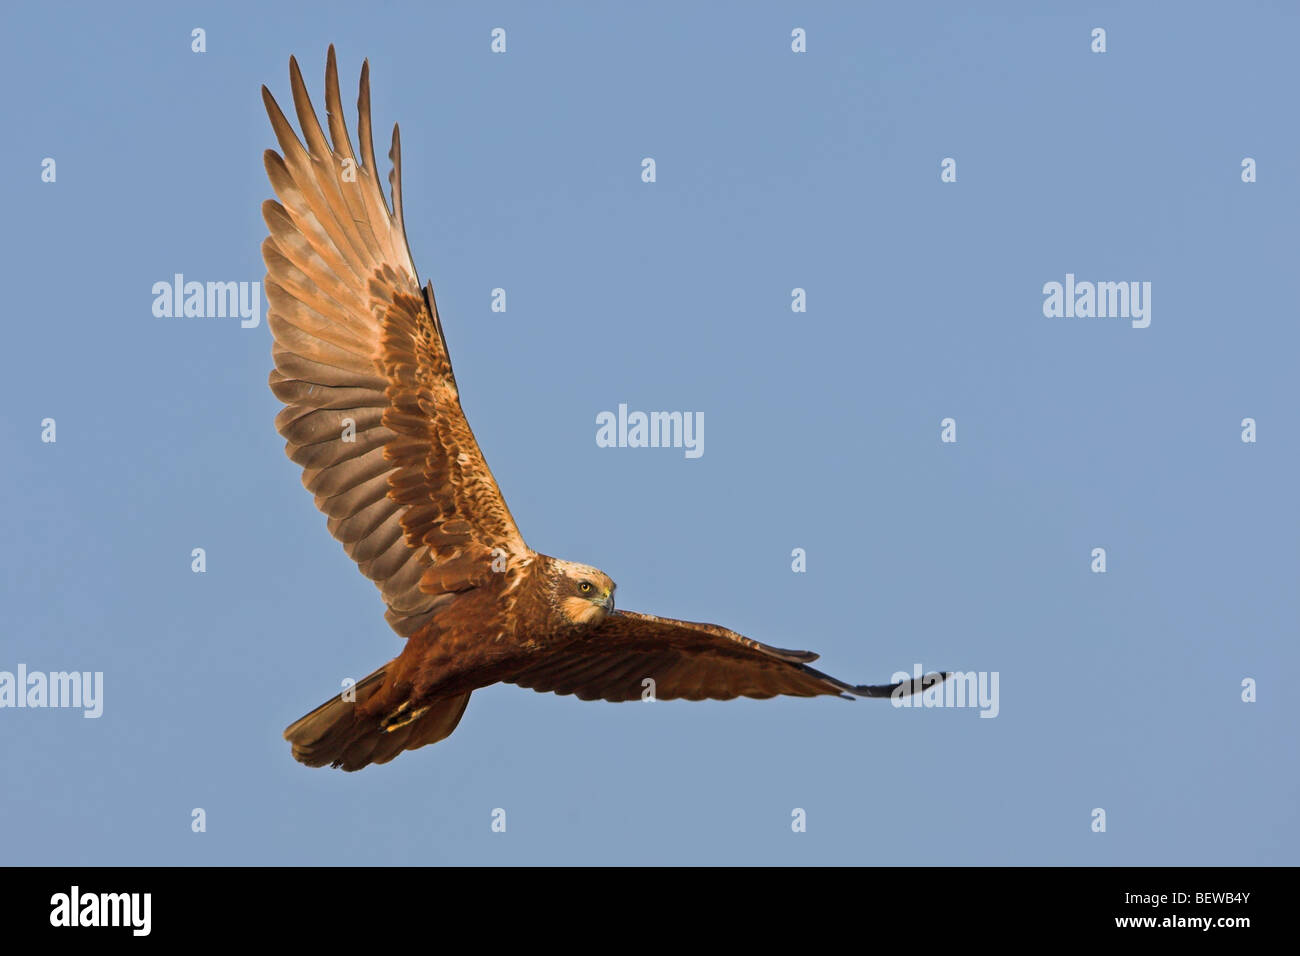 Western Marsh Harrier (Circus aeruginosus) in mid-air, view from below Stock Photo